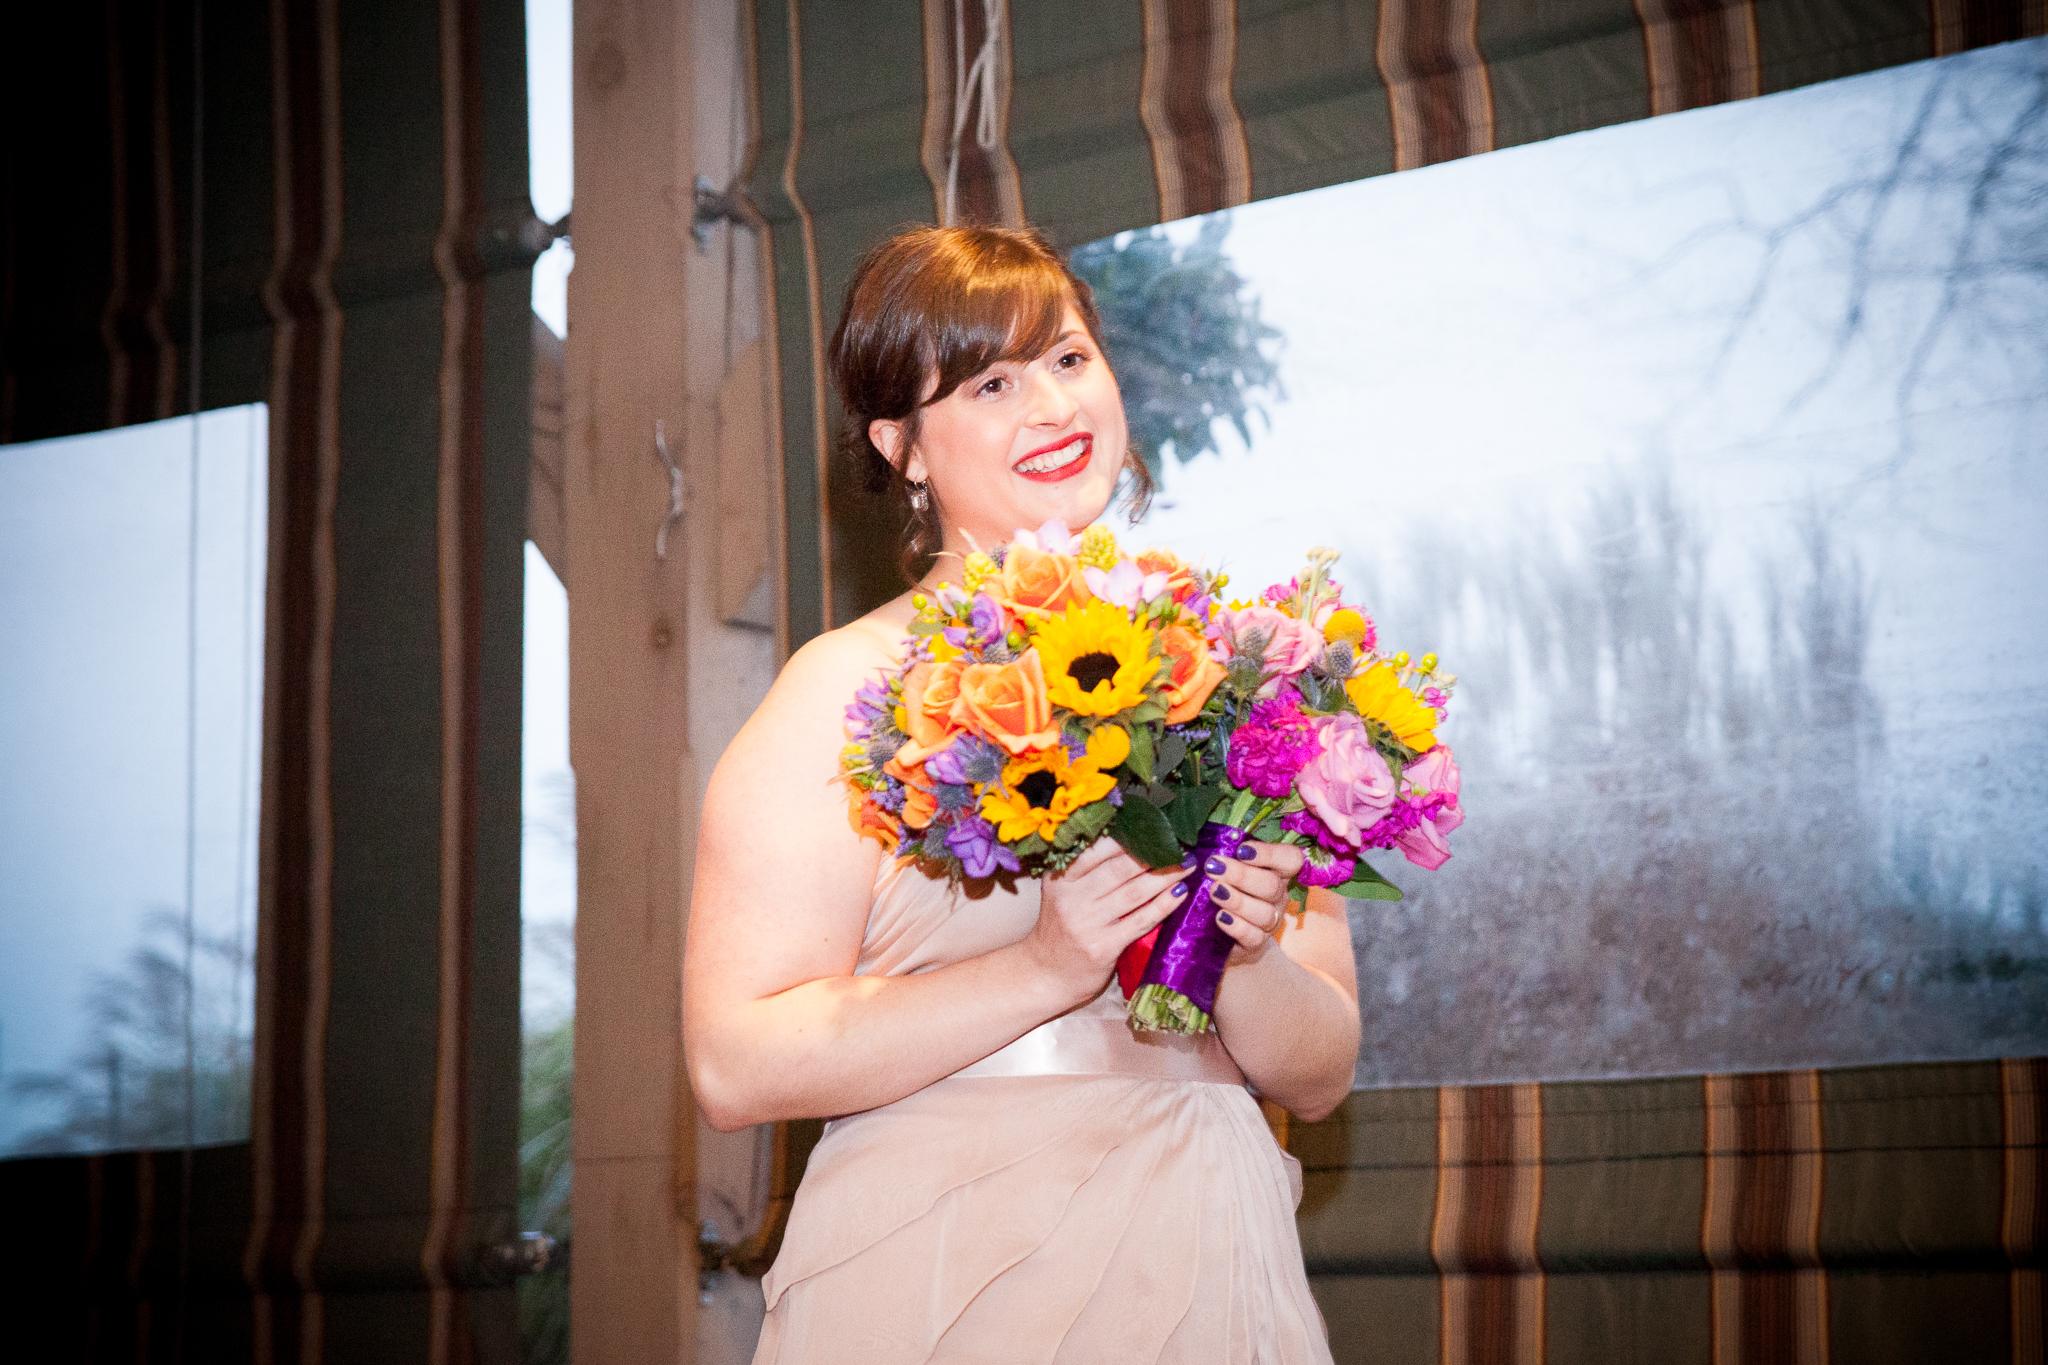 camuglia-whomstudio-chelsea_and_andy-nycphotographer-wedding-brooklyn-buffalo-timberlodge-086-0631.jpg